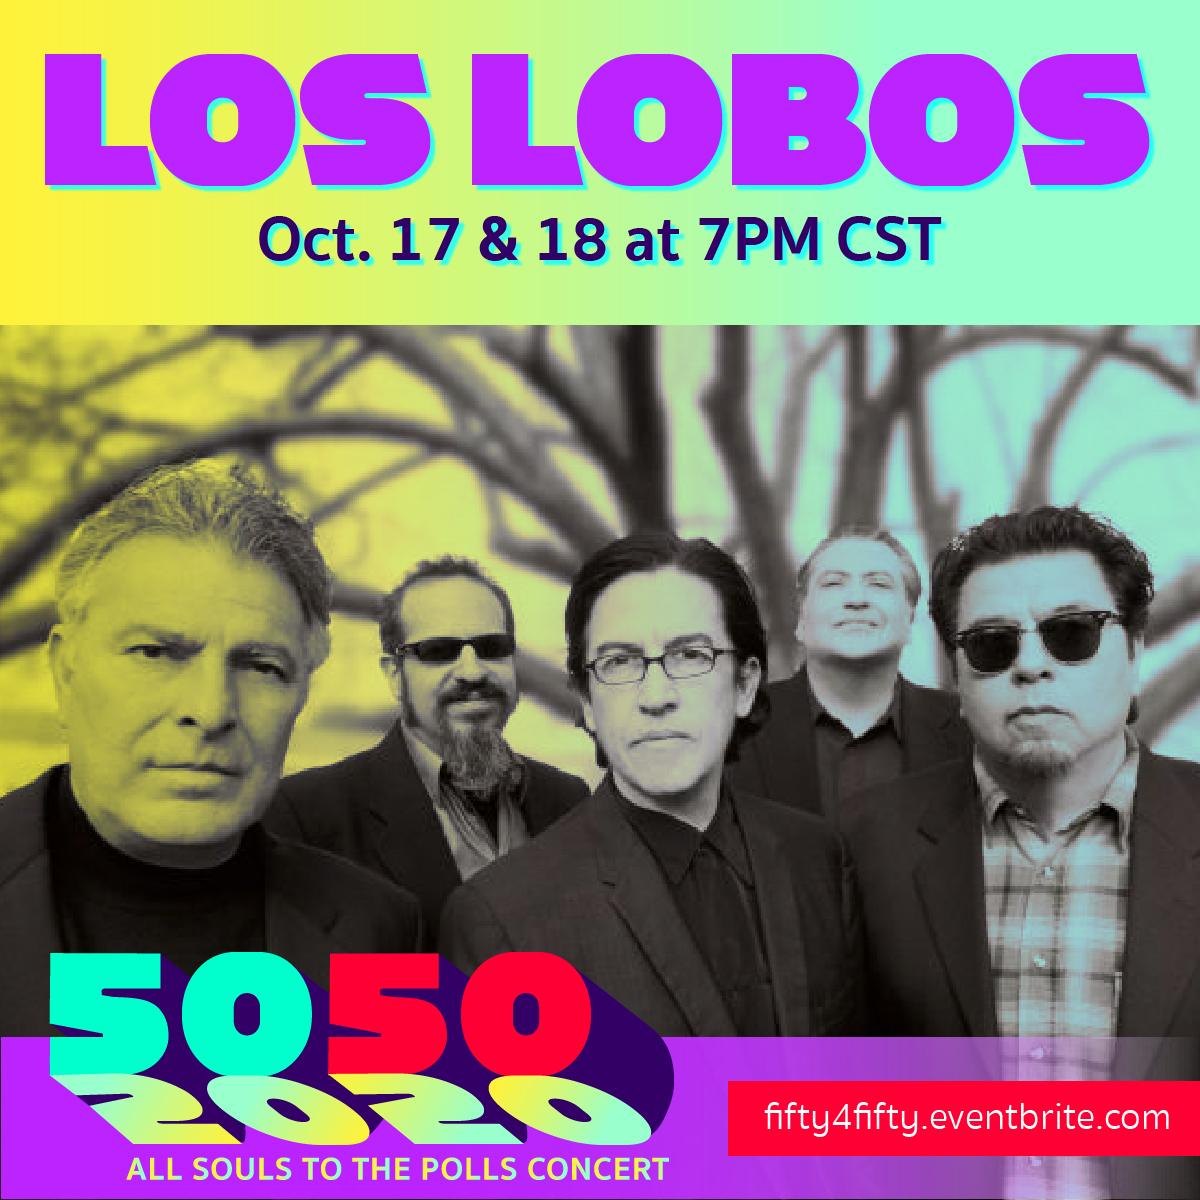 5050 Concert social media tile